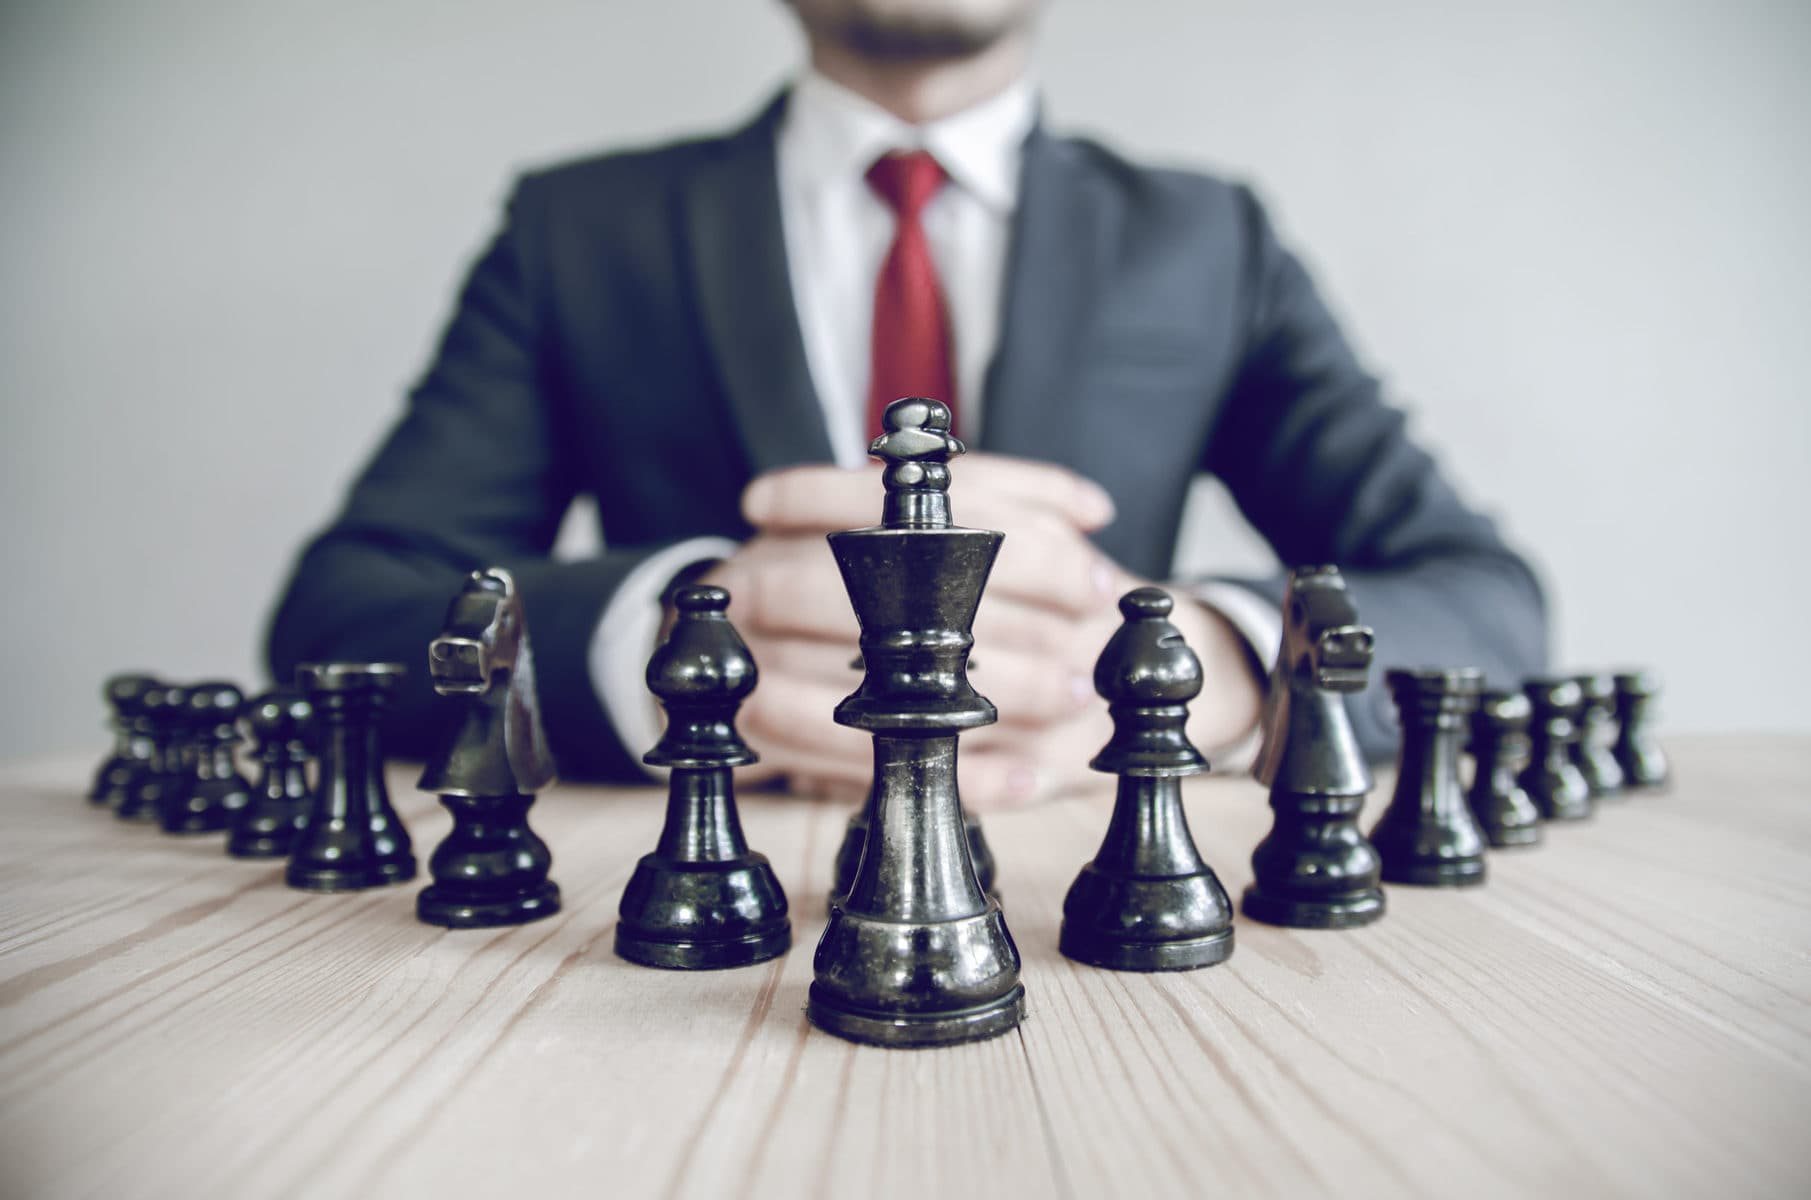 Characteristics of Leaders